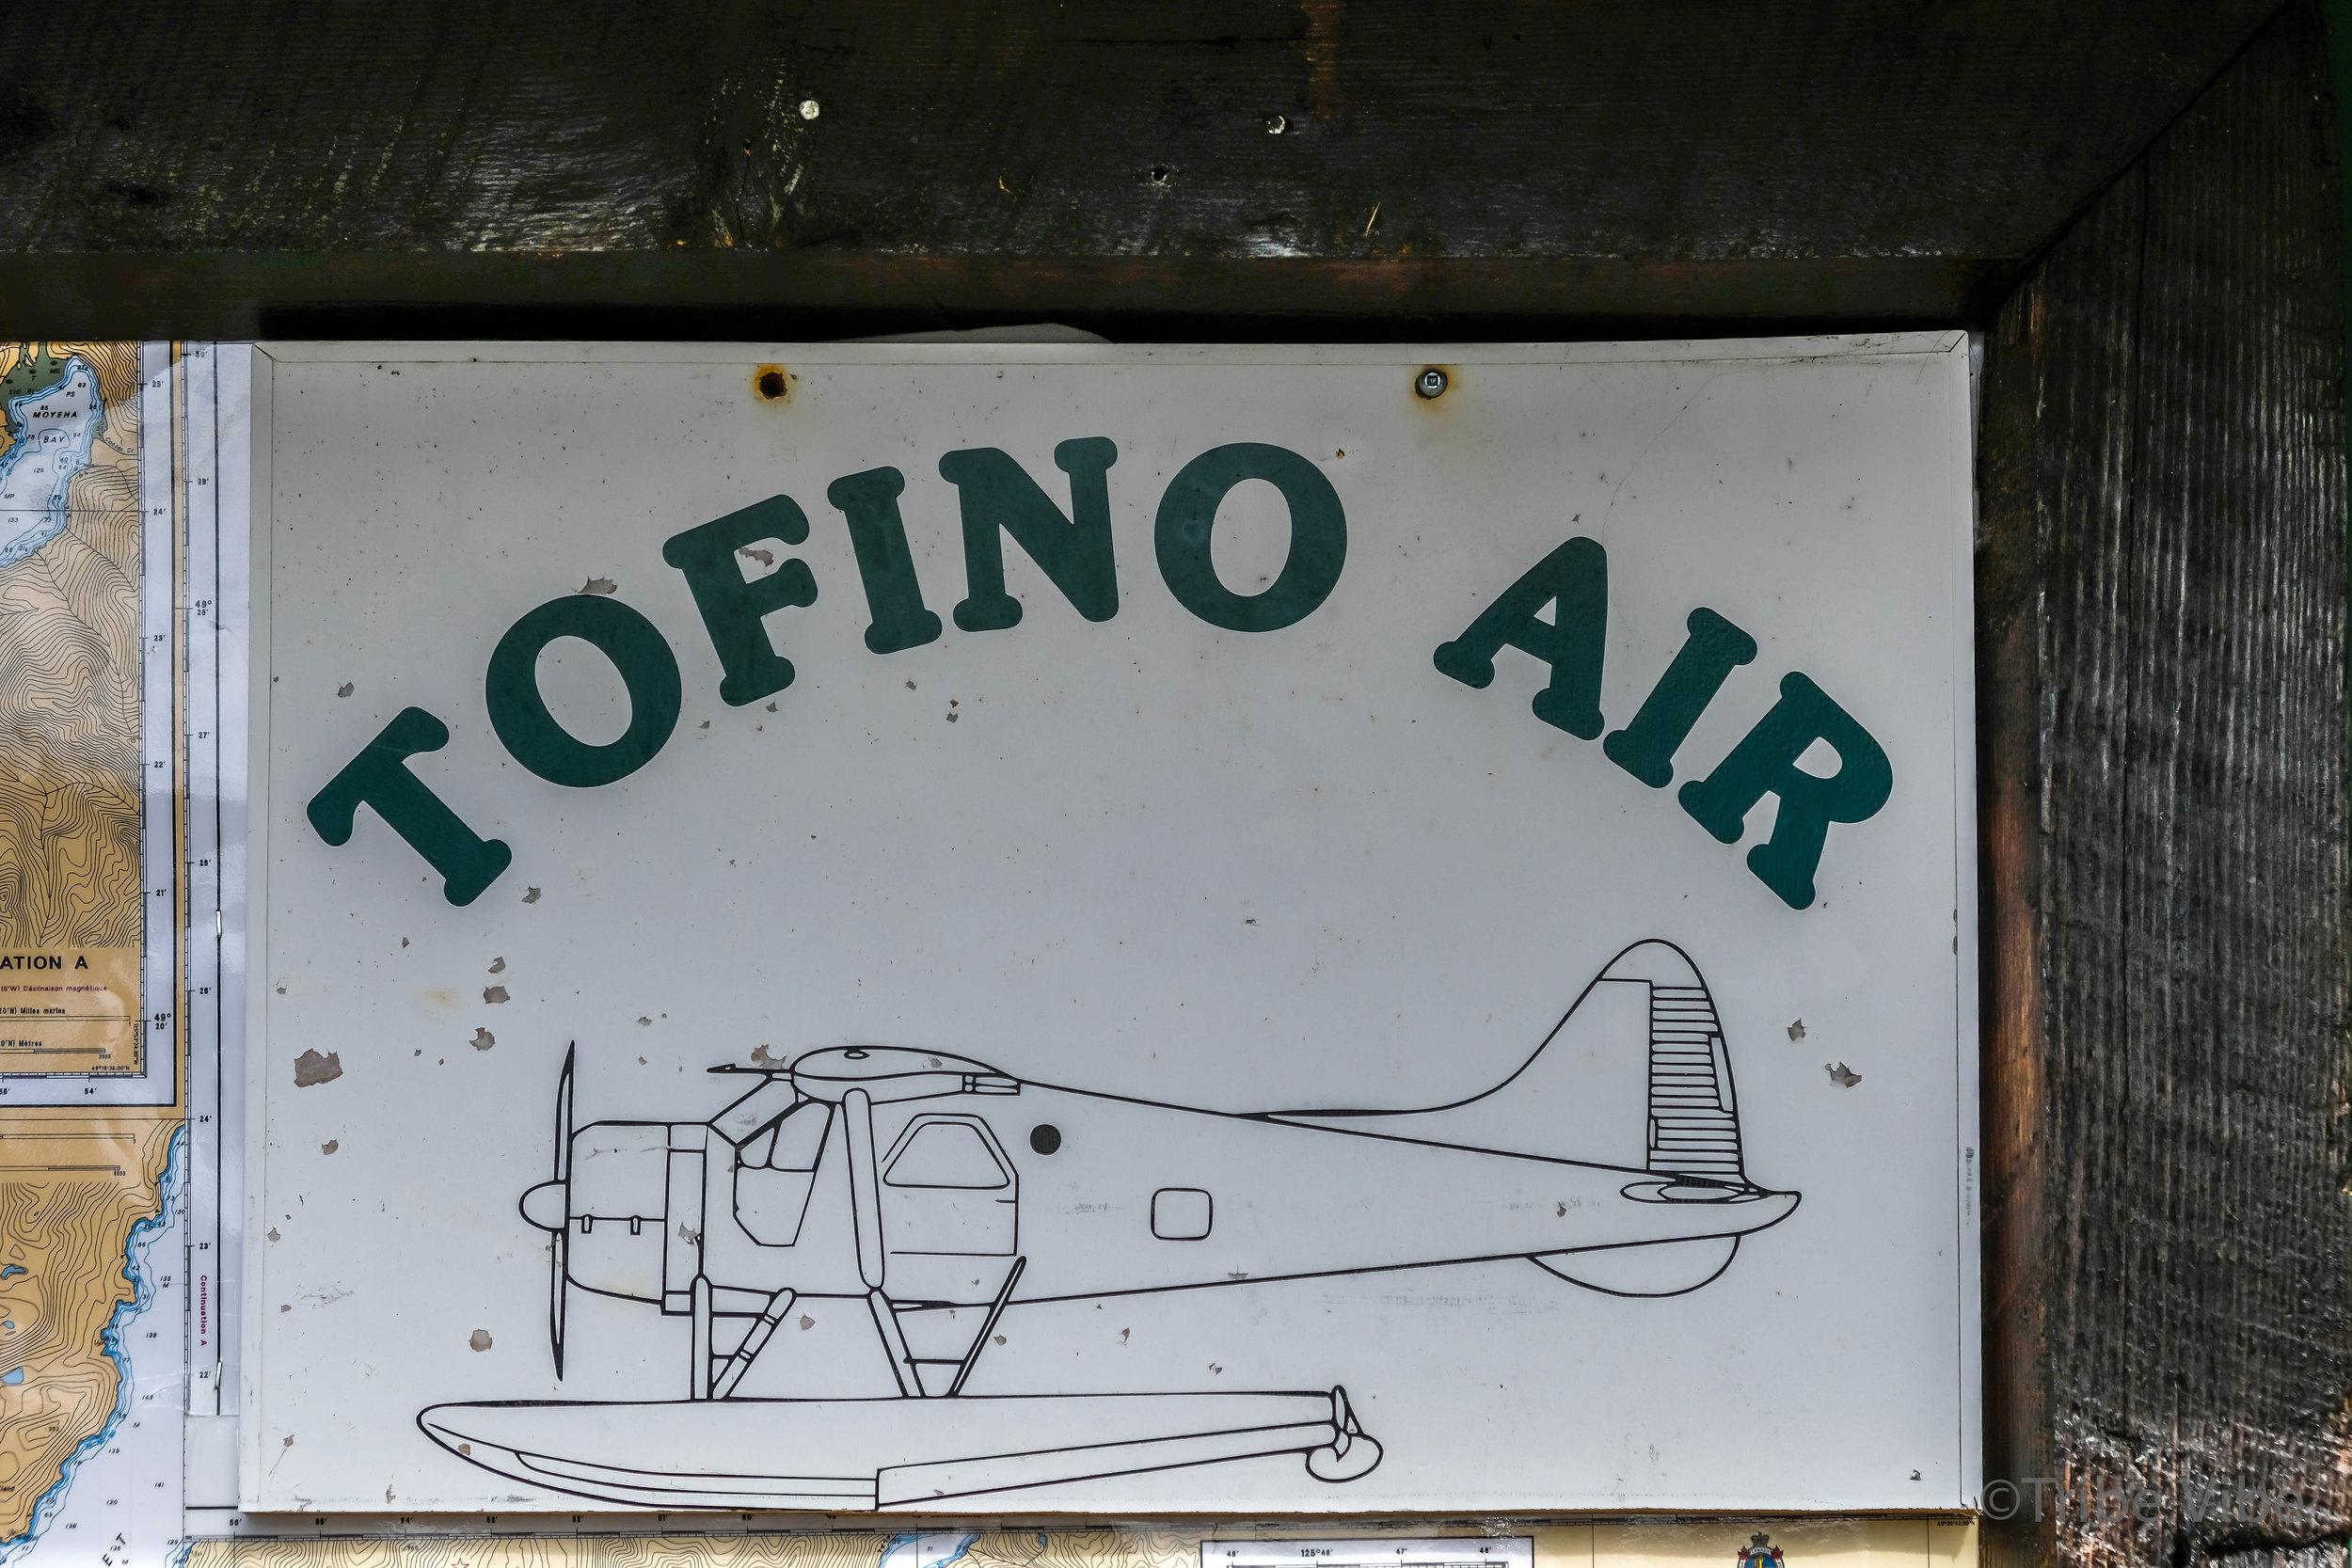 Take a floater plane around Tofino, British Columbia